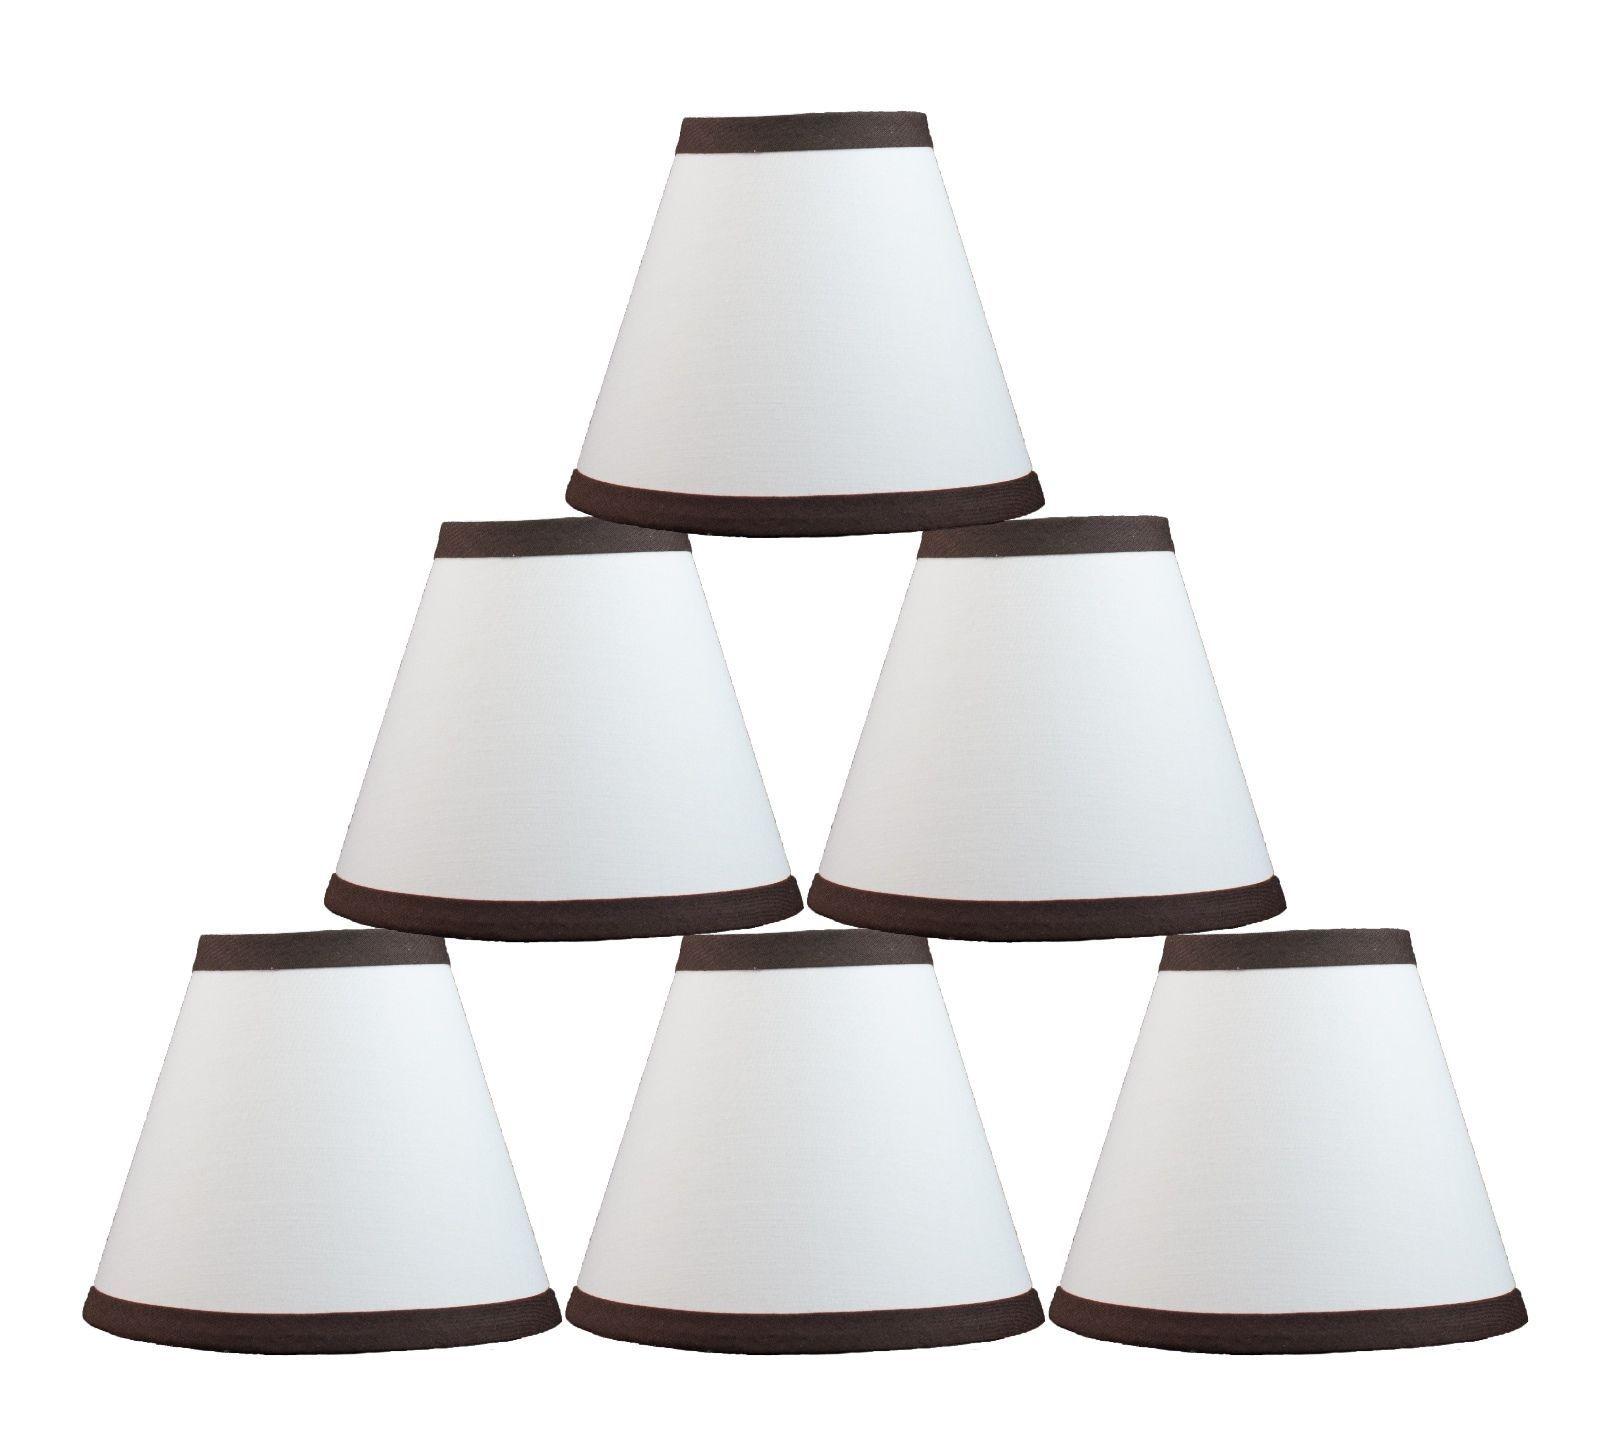 urbanest white cotton w coffee trim chandelier mini lamp shade 3x6x5 set of 6 lamp shades. Black Bedroom Furniture Sets. Home Design Ideas